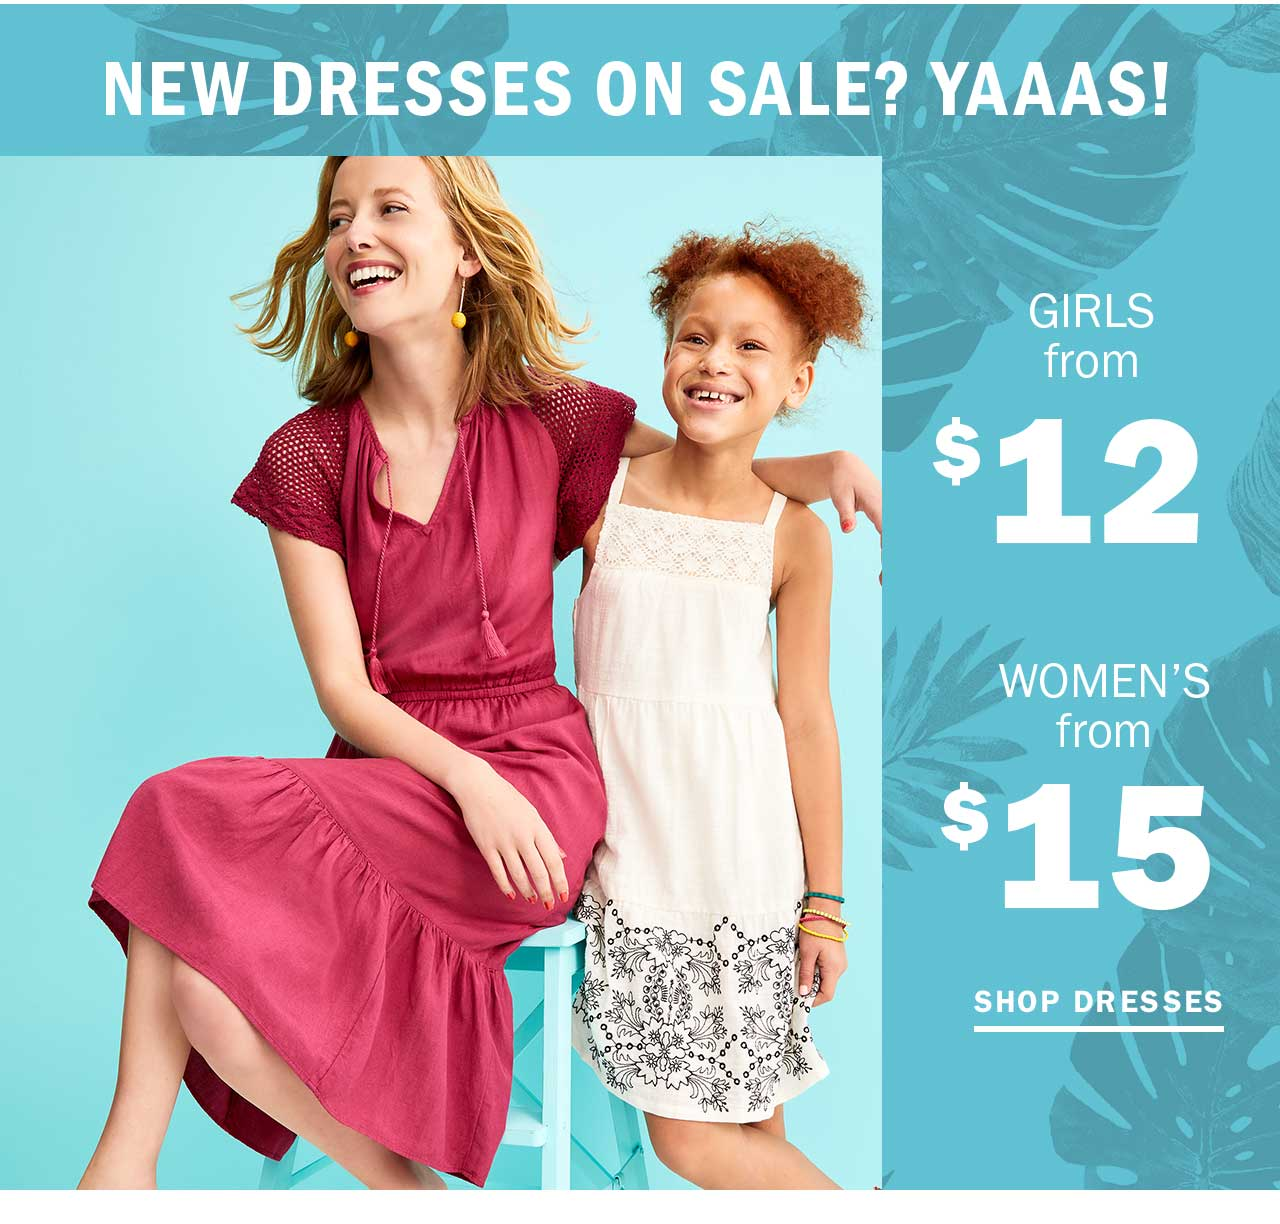 NEW DRESSES ON SALE? YAAAS! | SHOP DRESSES